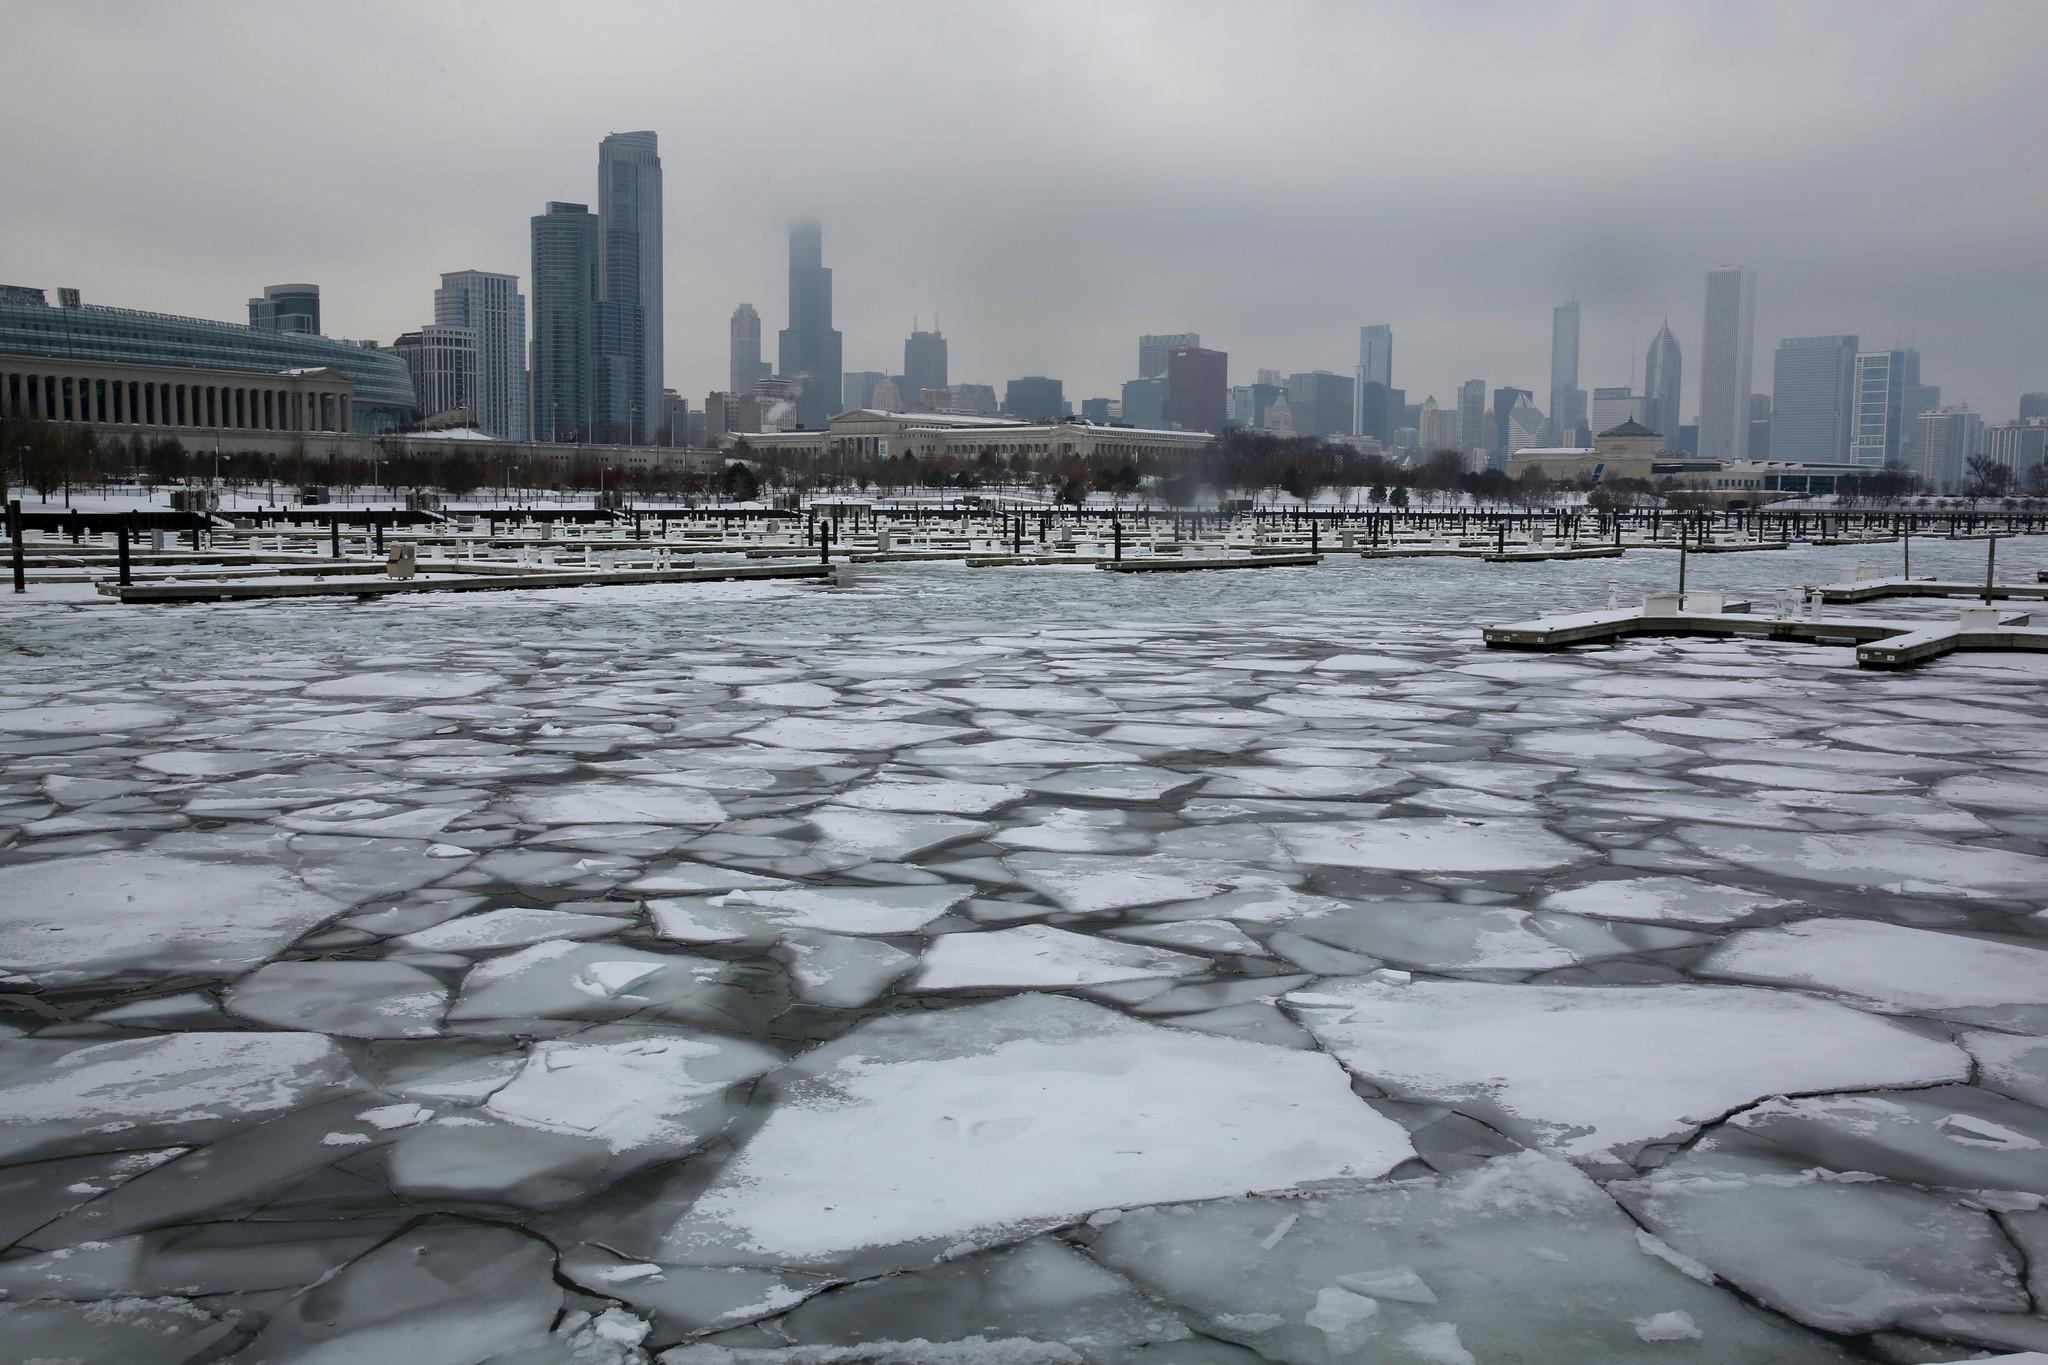 chicago weather - photo #4